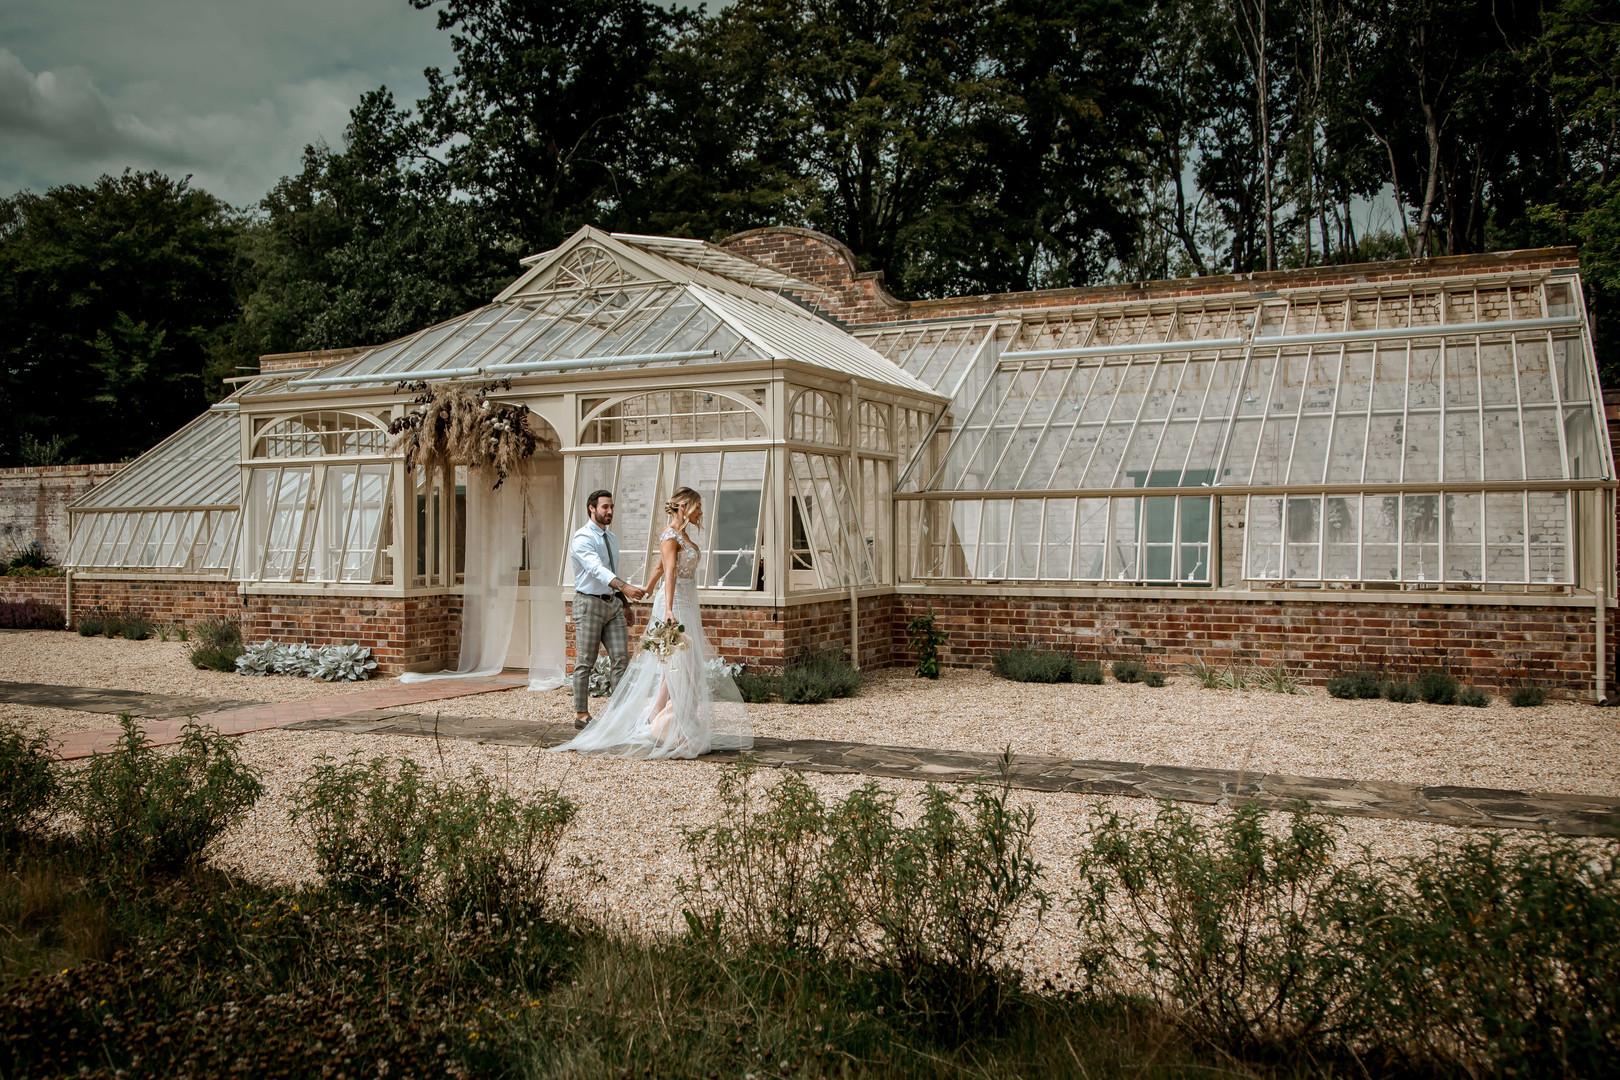 Wedding Elopement Photographer | Charlie Britz Photography | Surrey, UK